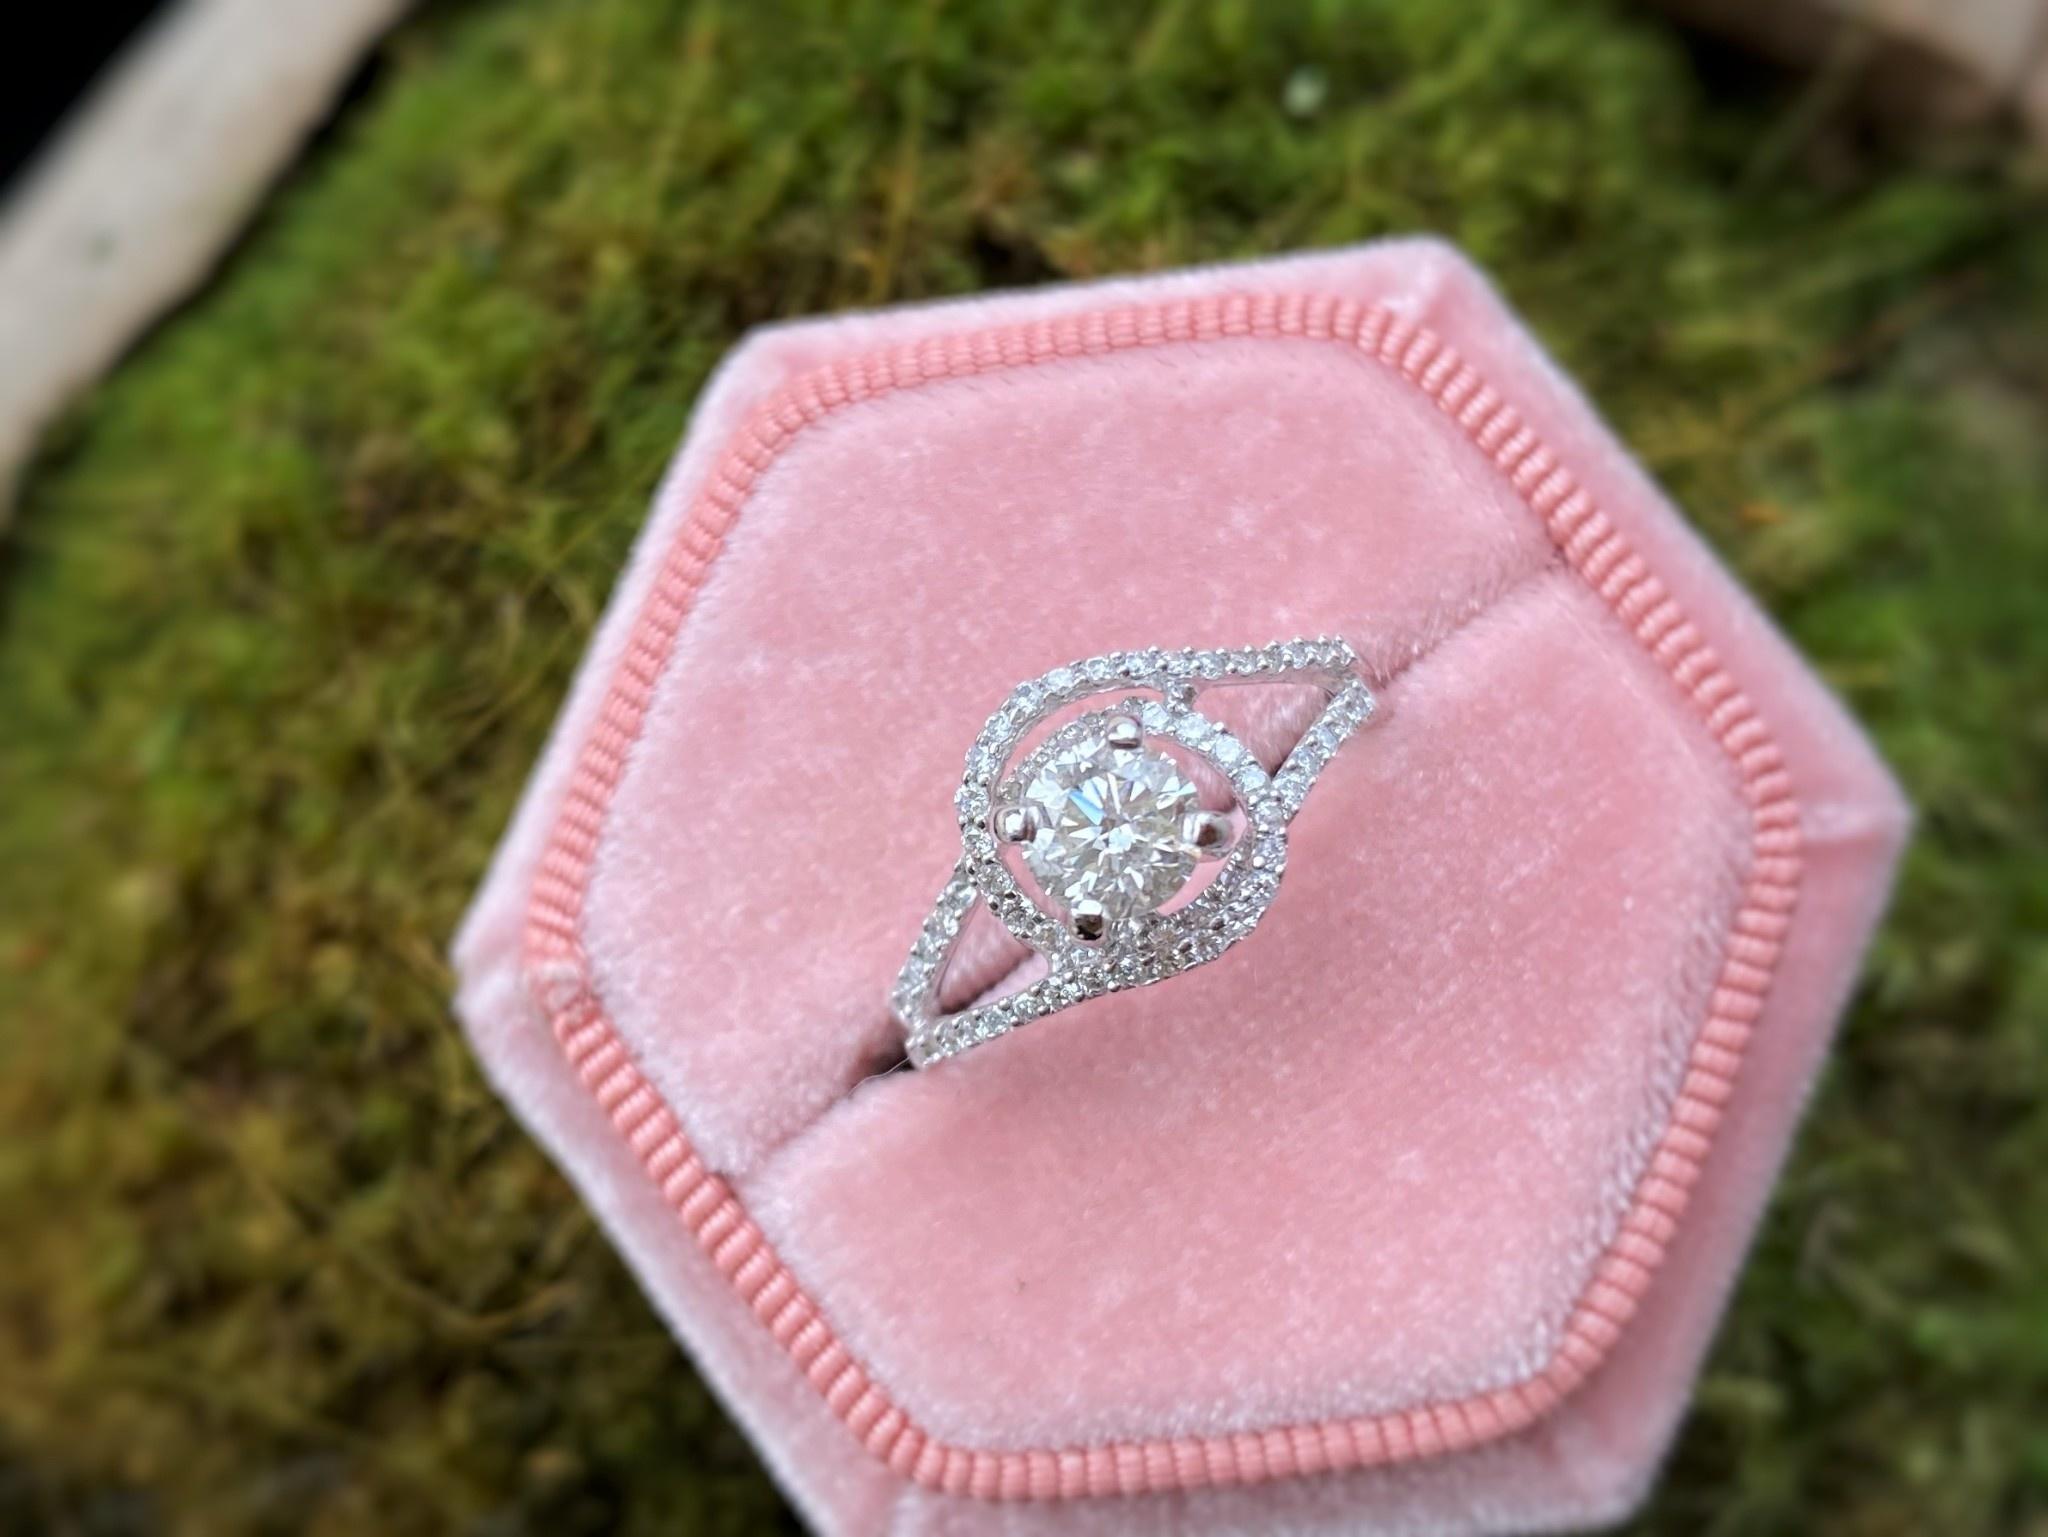 18k White Gold Diamond Engagement Ring 0.74tdw